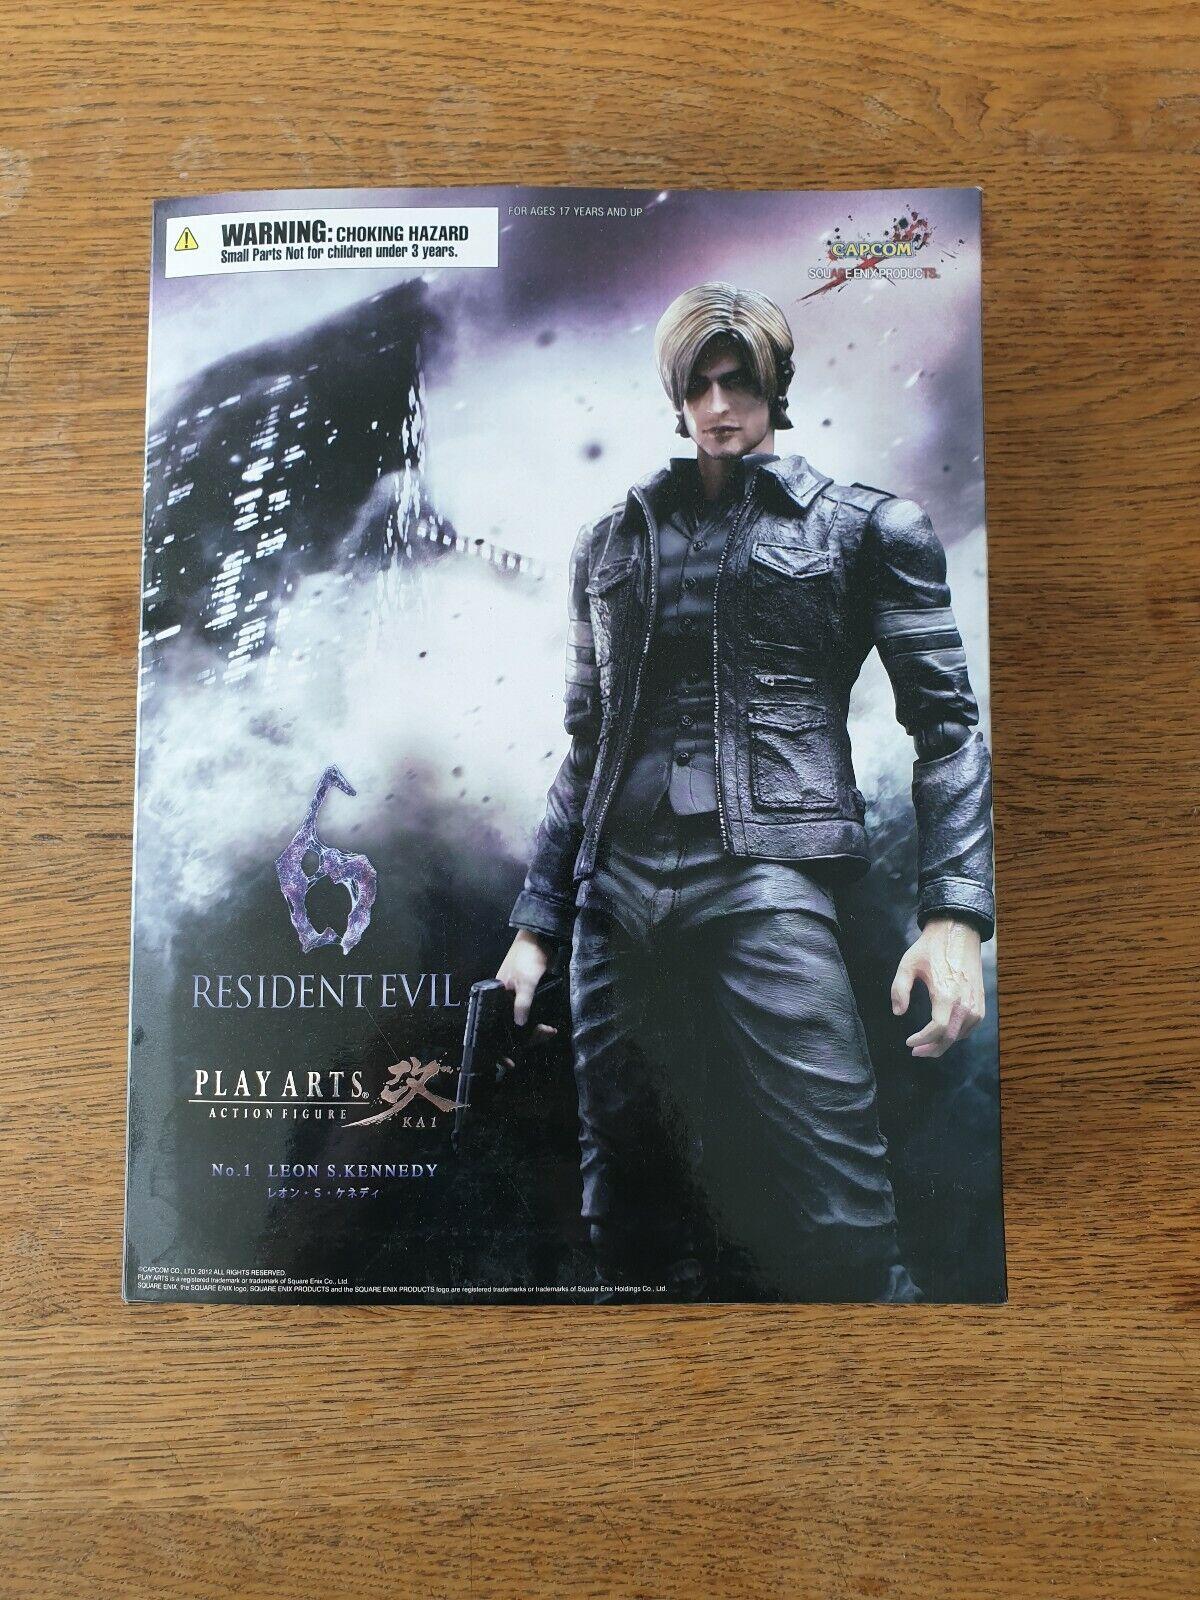 Resident evil 6 - Play Arts - Leon S. Kennedy